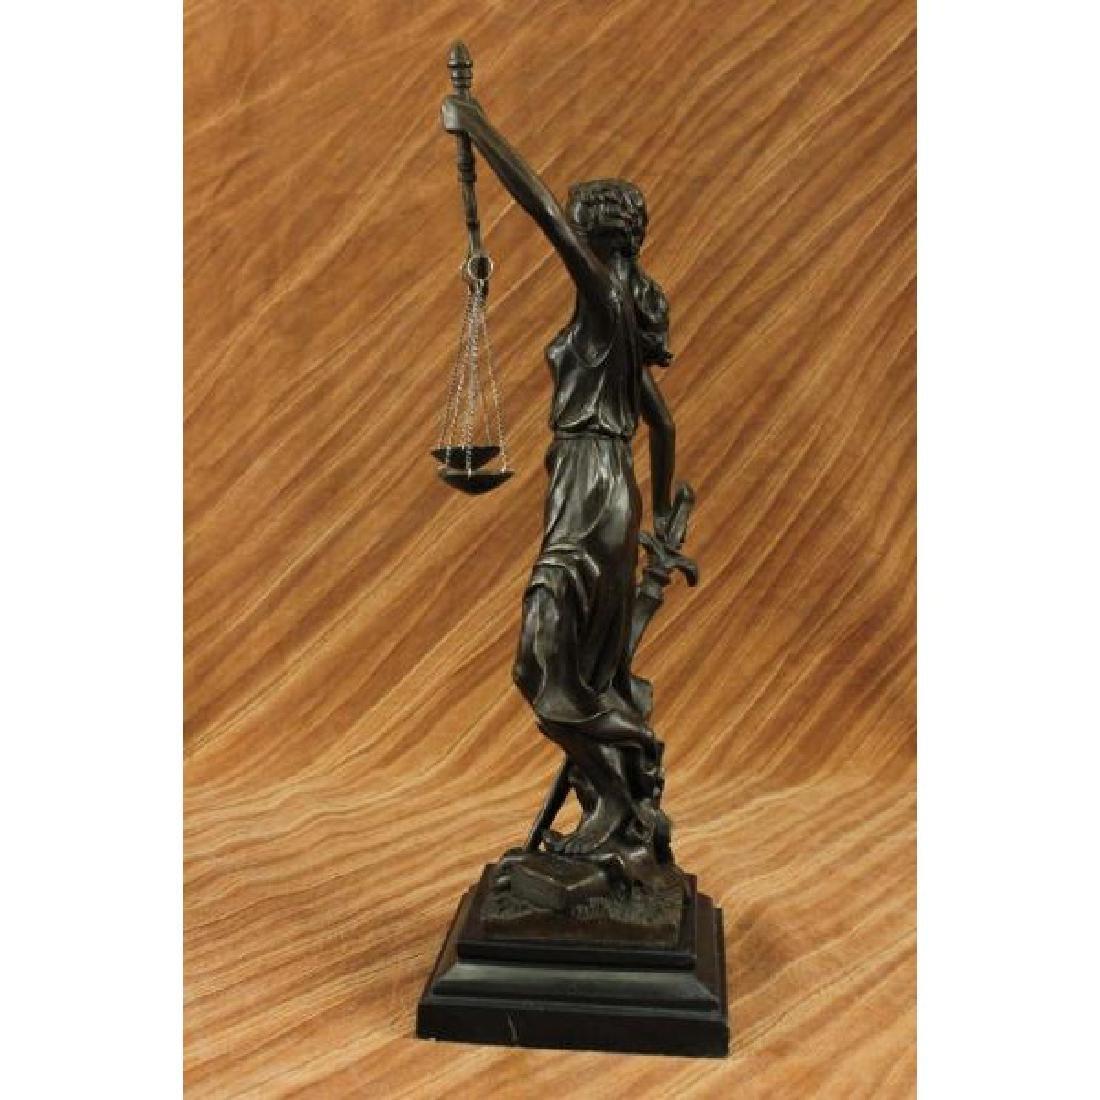 Blind Justice - Scale of Justice Bronze Sculpture - 2